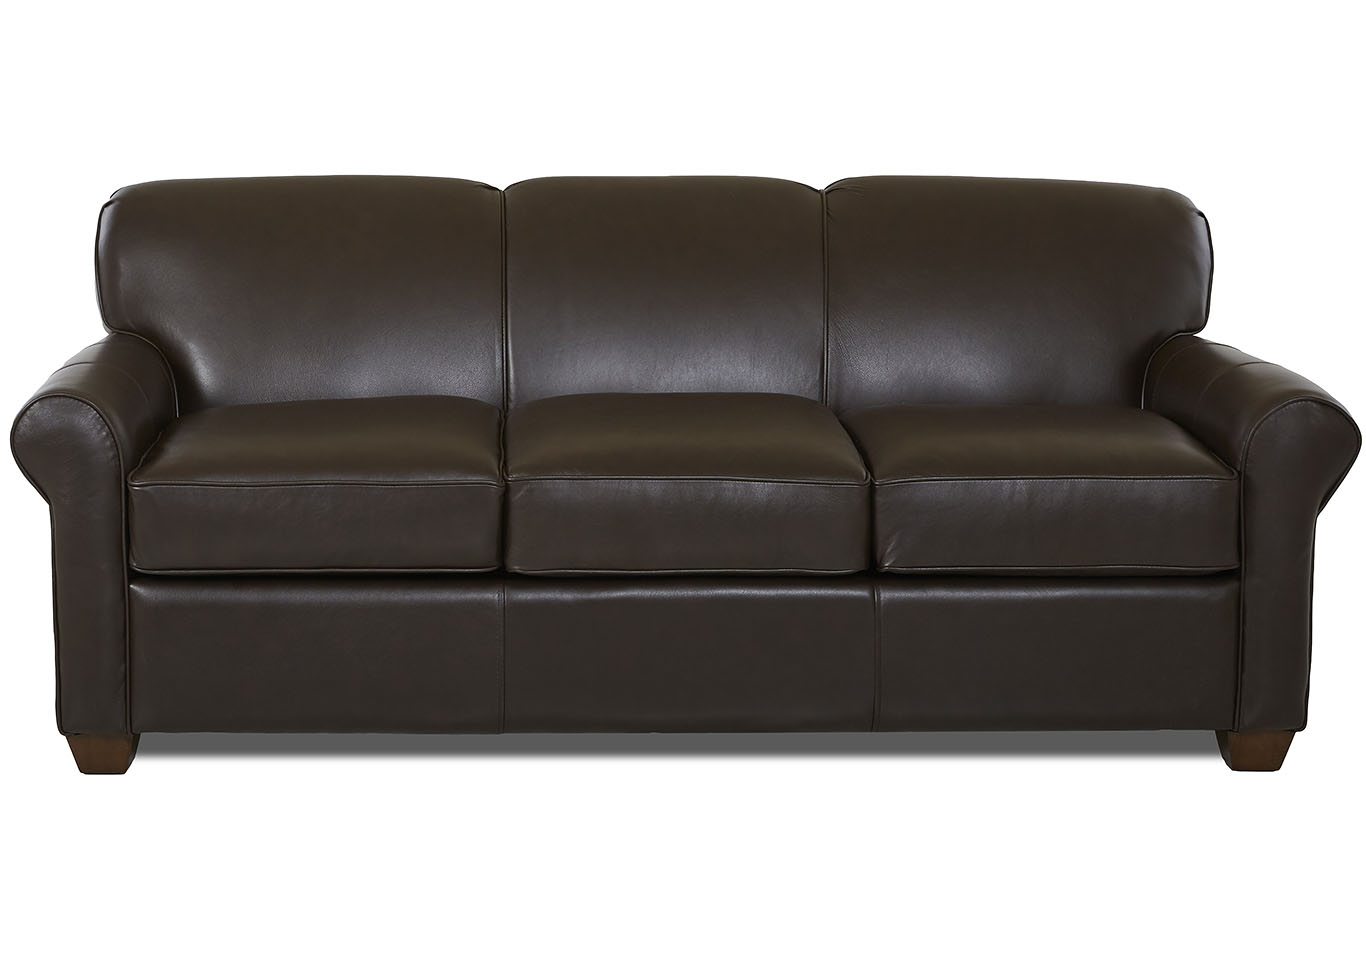 Beau Mayhew Durango Expresso Brown Leather Sleeper Sofa,Klaussner Home  Furnishings